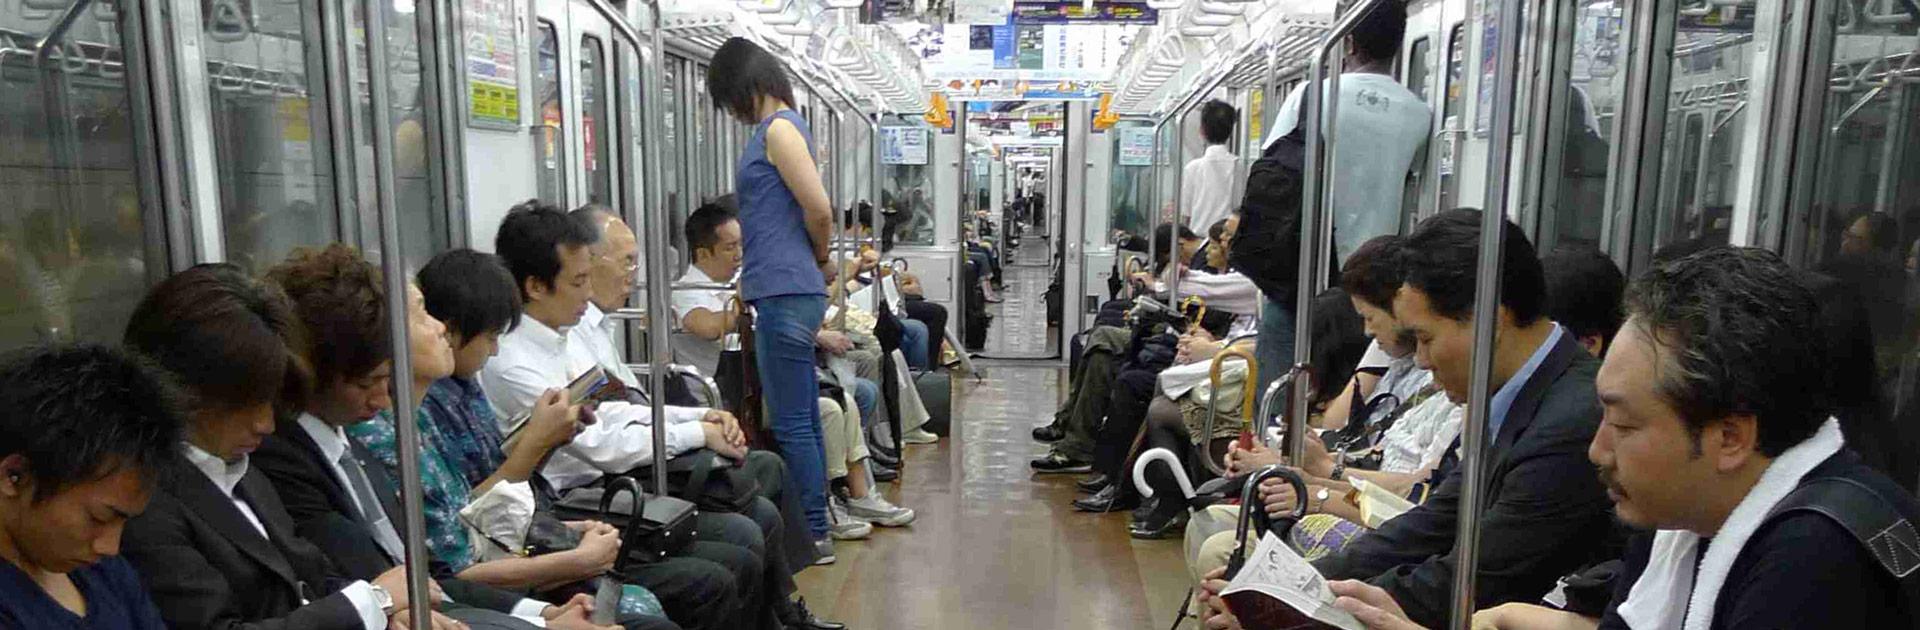 X Tokyo Subway 4055463598 758644c707 o